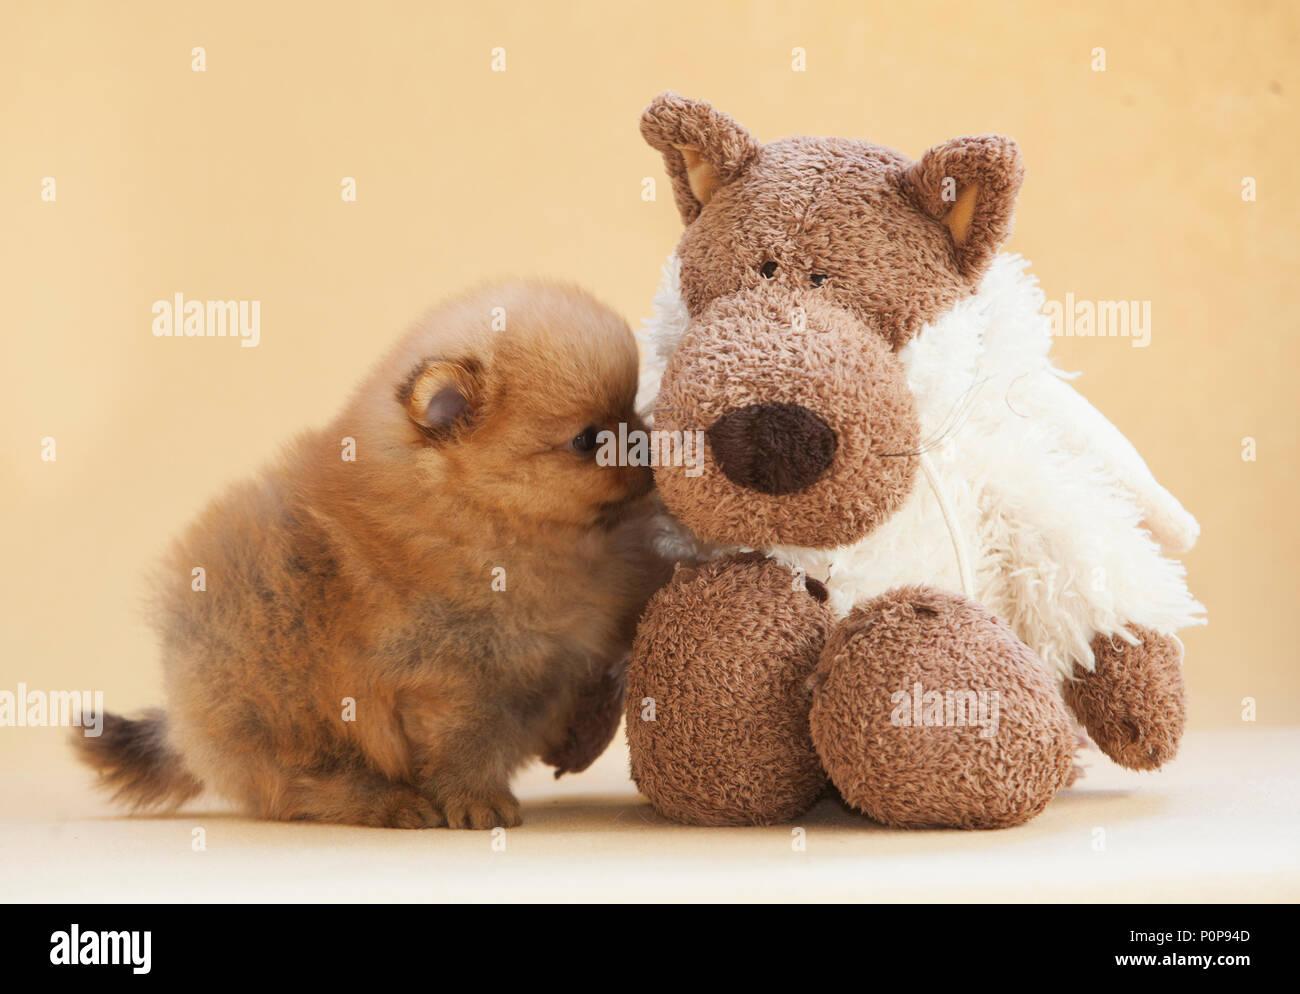 Teddy Bear Pomeranian Stock Photos Teddy Bear Pomeranian Stock